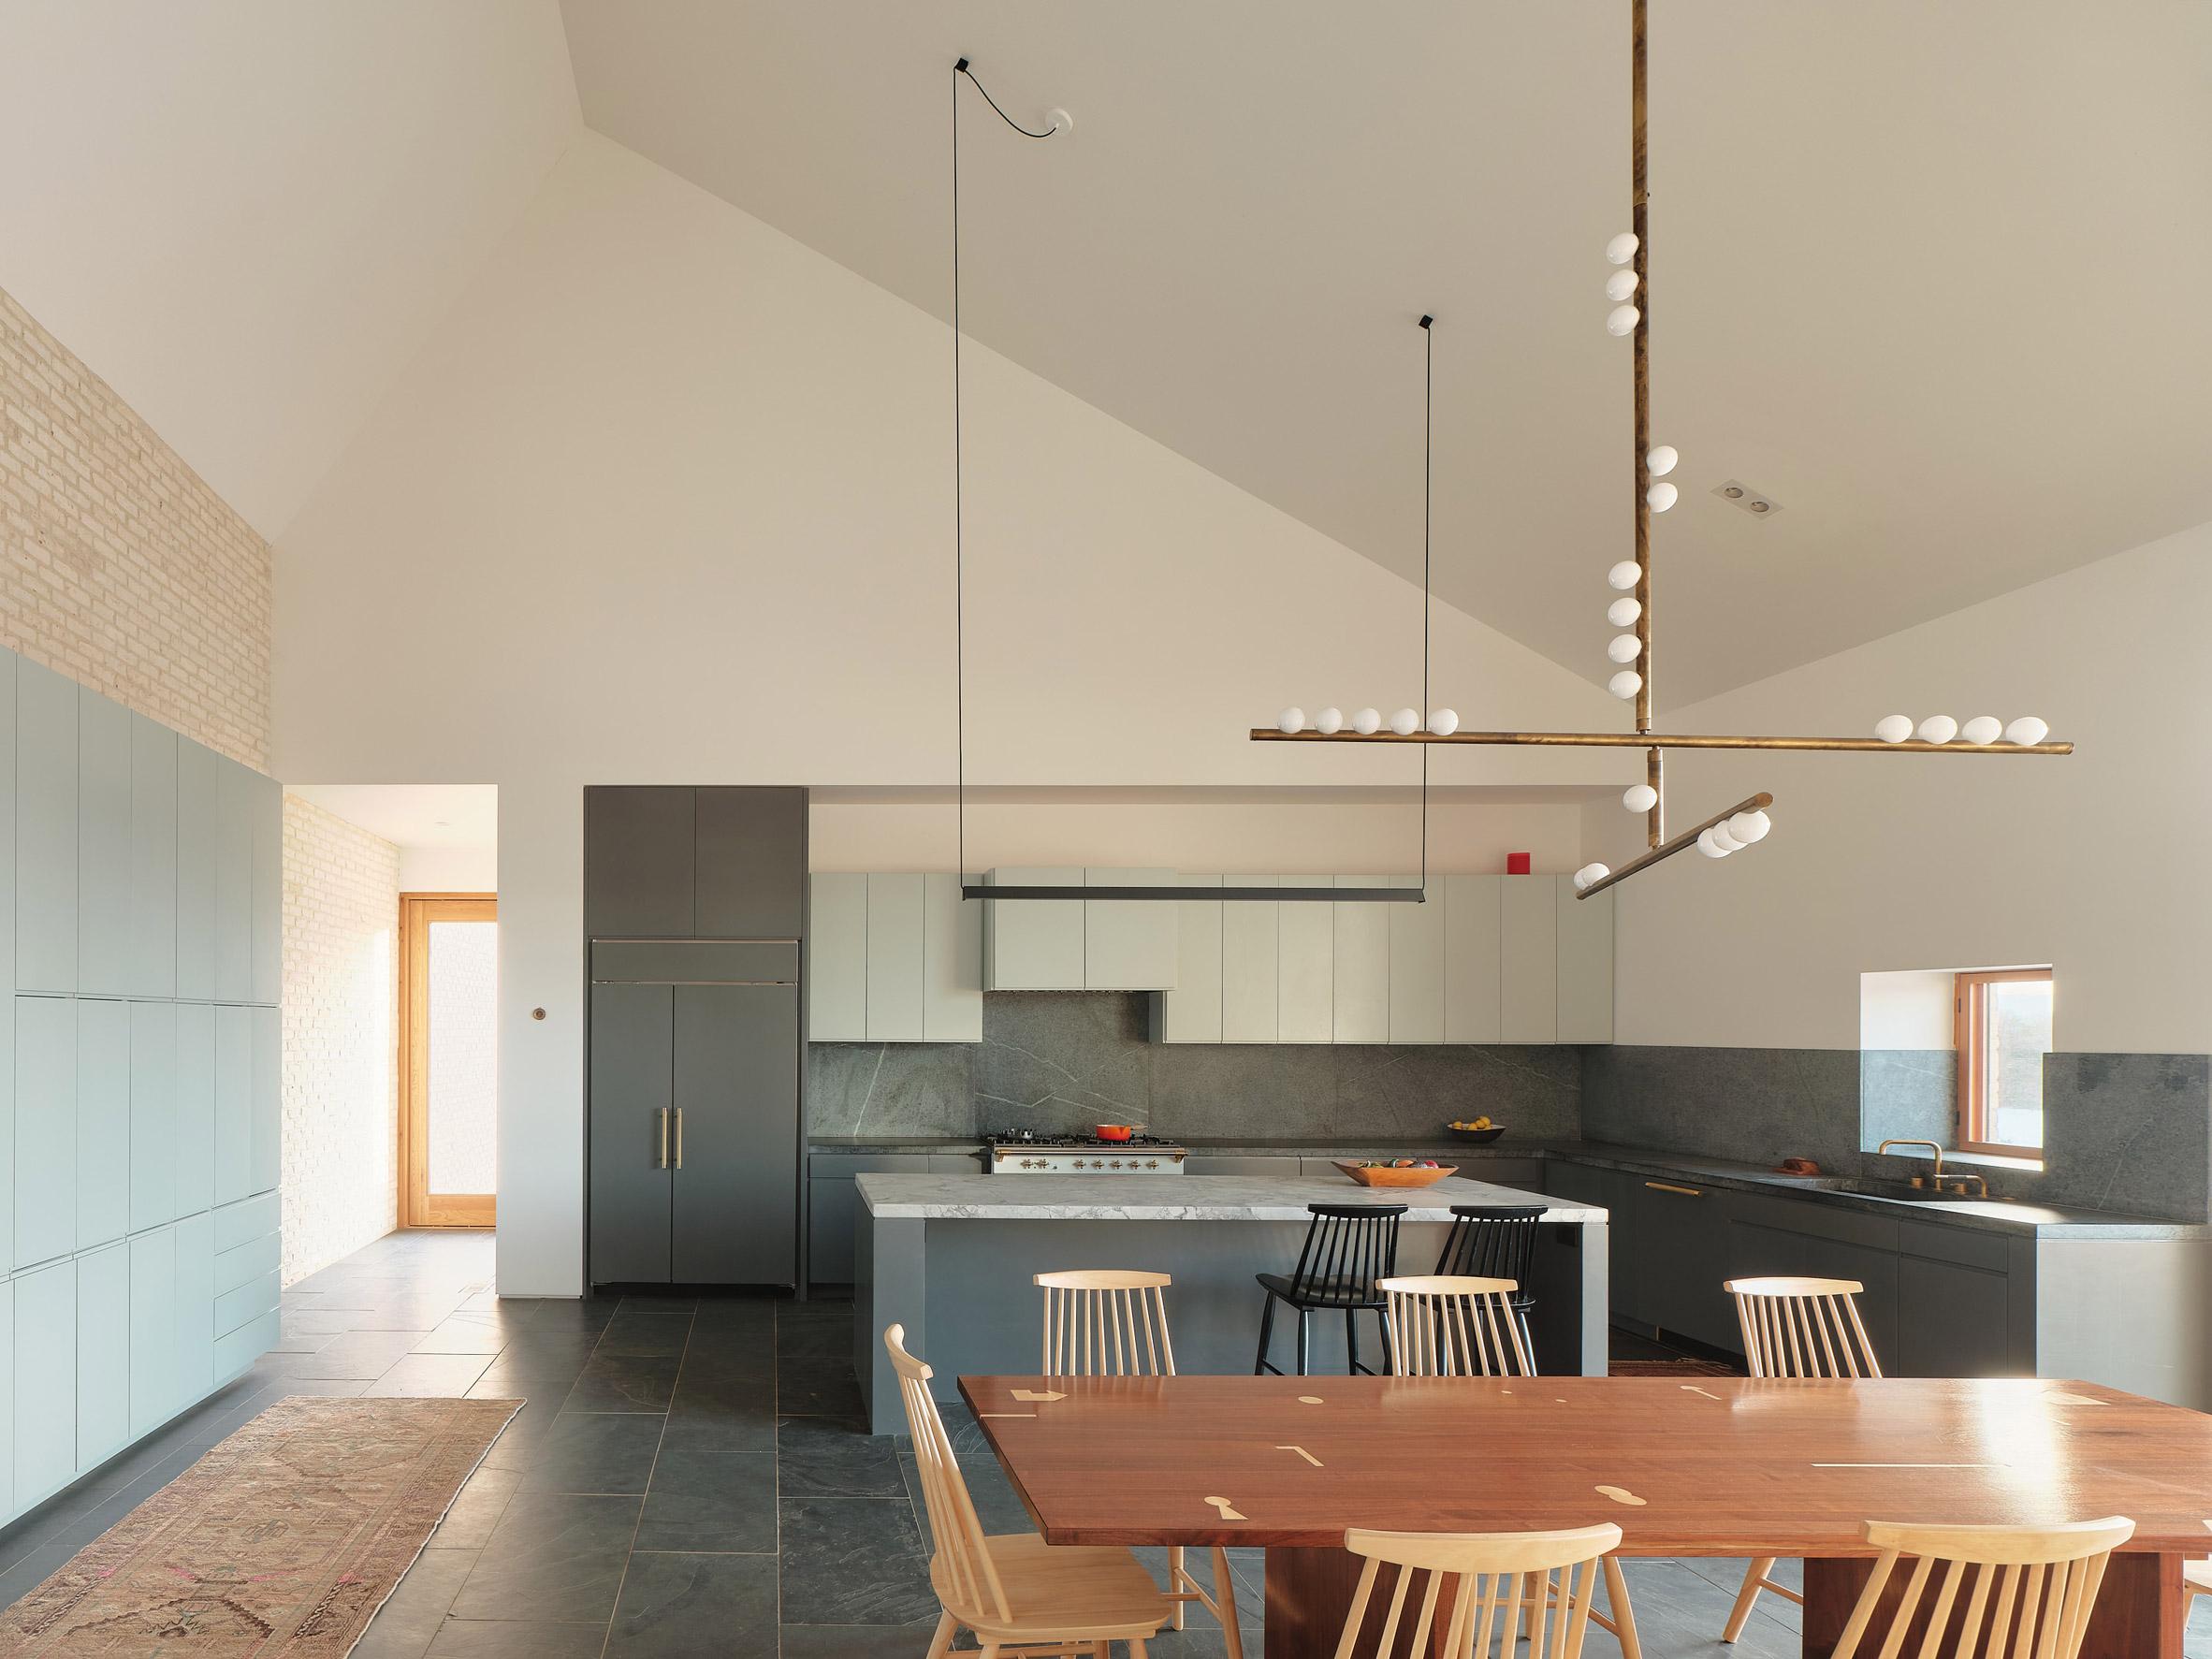 Casa de tres chimeneas por TW Ryan Architecture